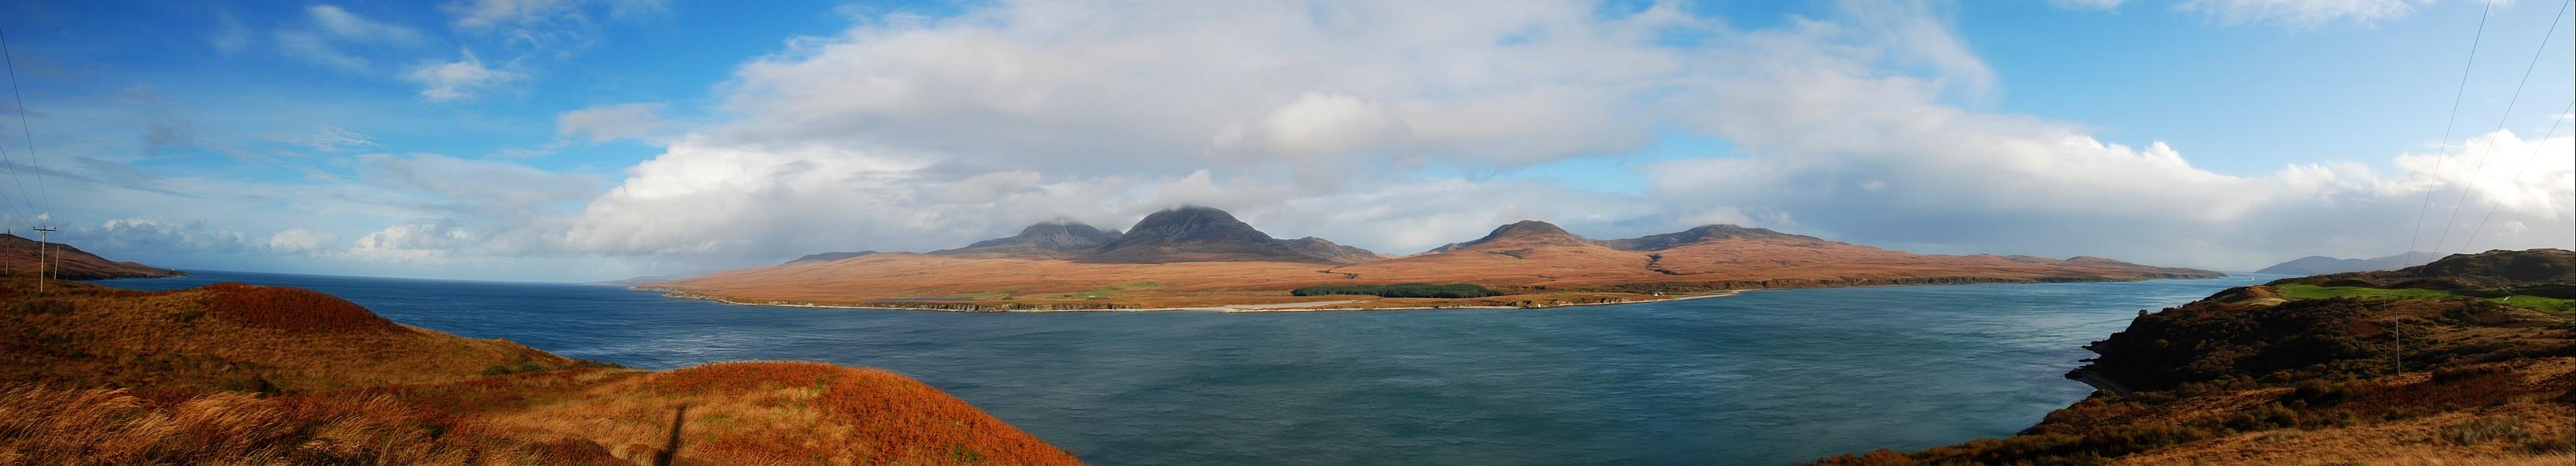 Isle of Jura Panorama Picture